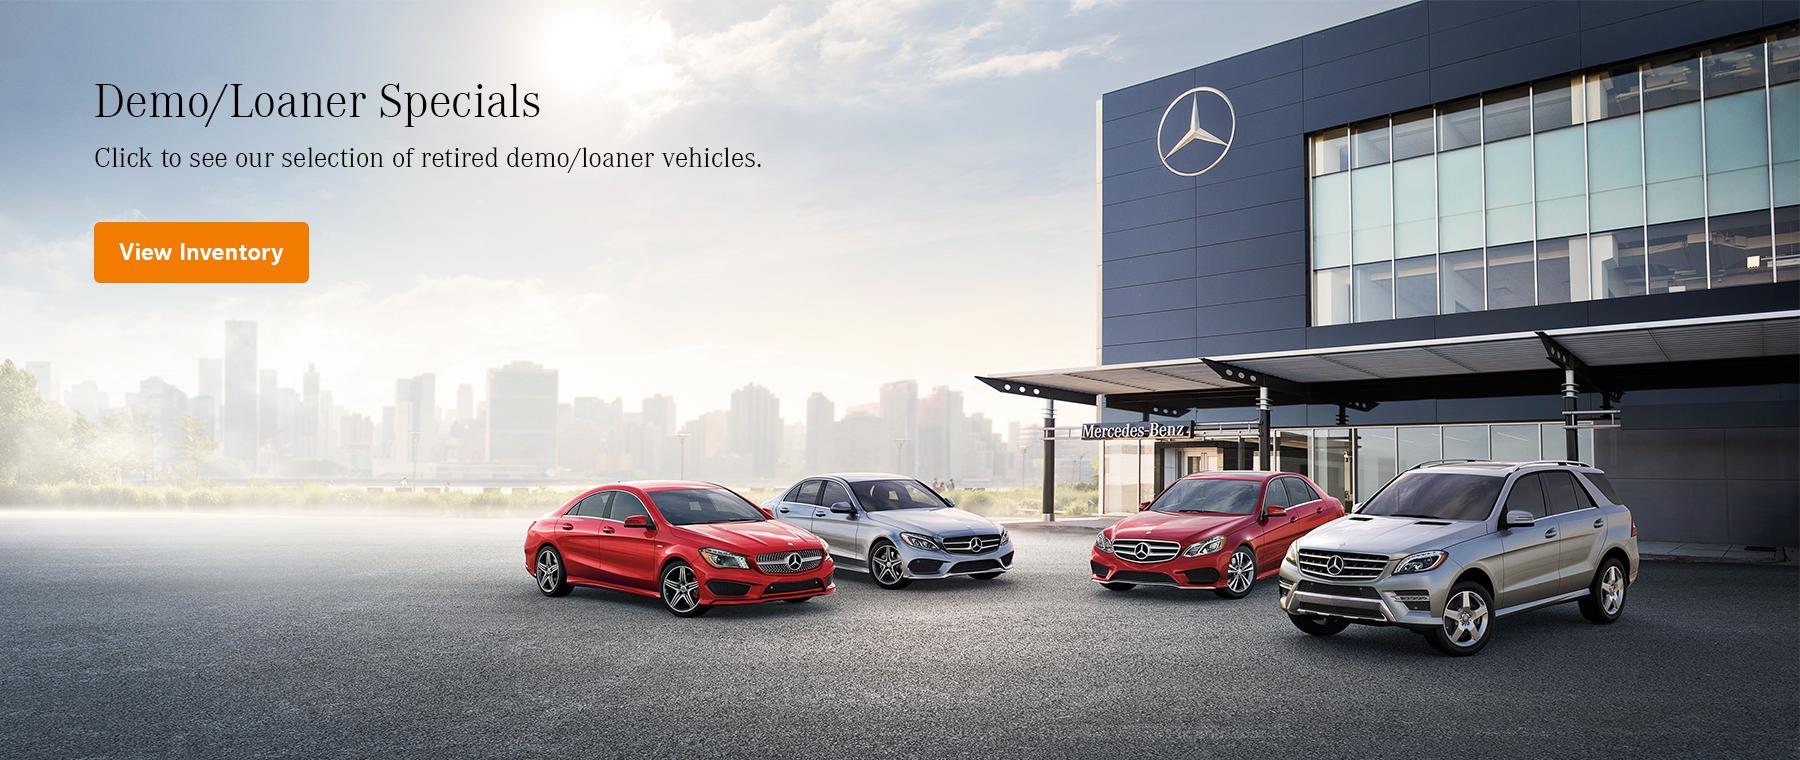 Mercedes benz of midlothian in va new used cars for Midlothian mercedes benz dealer